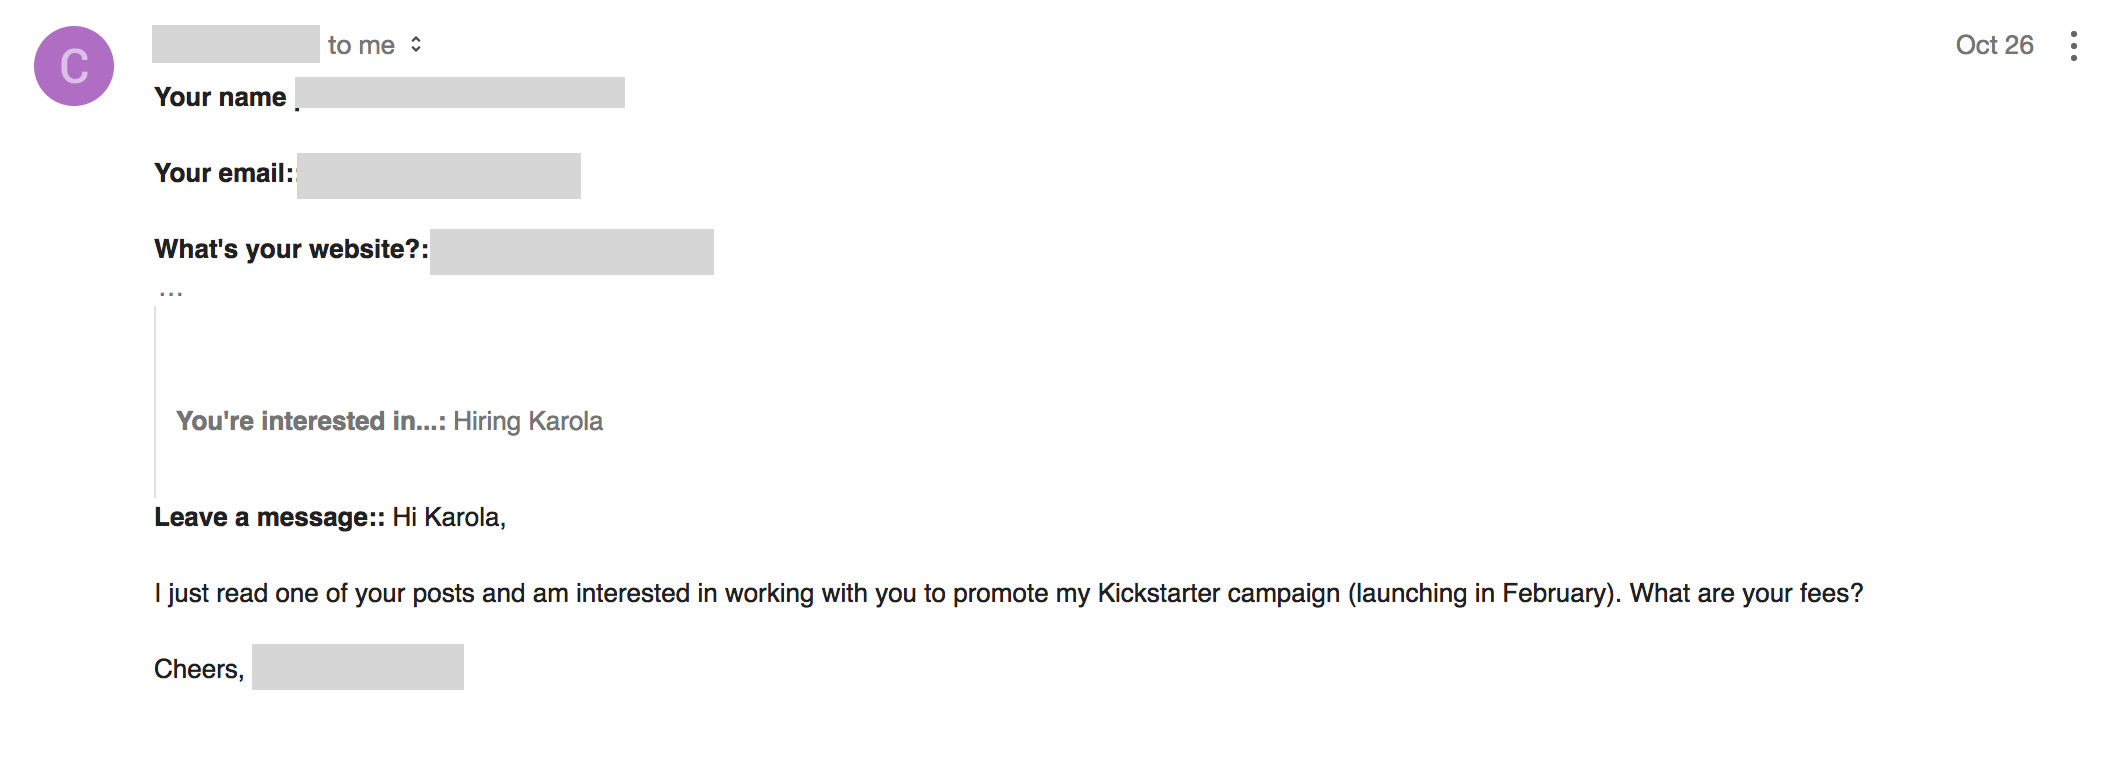 sometimes you get hired via guest blogging